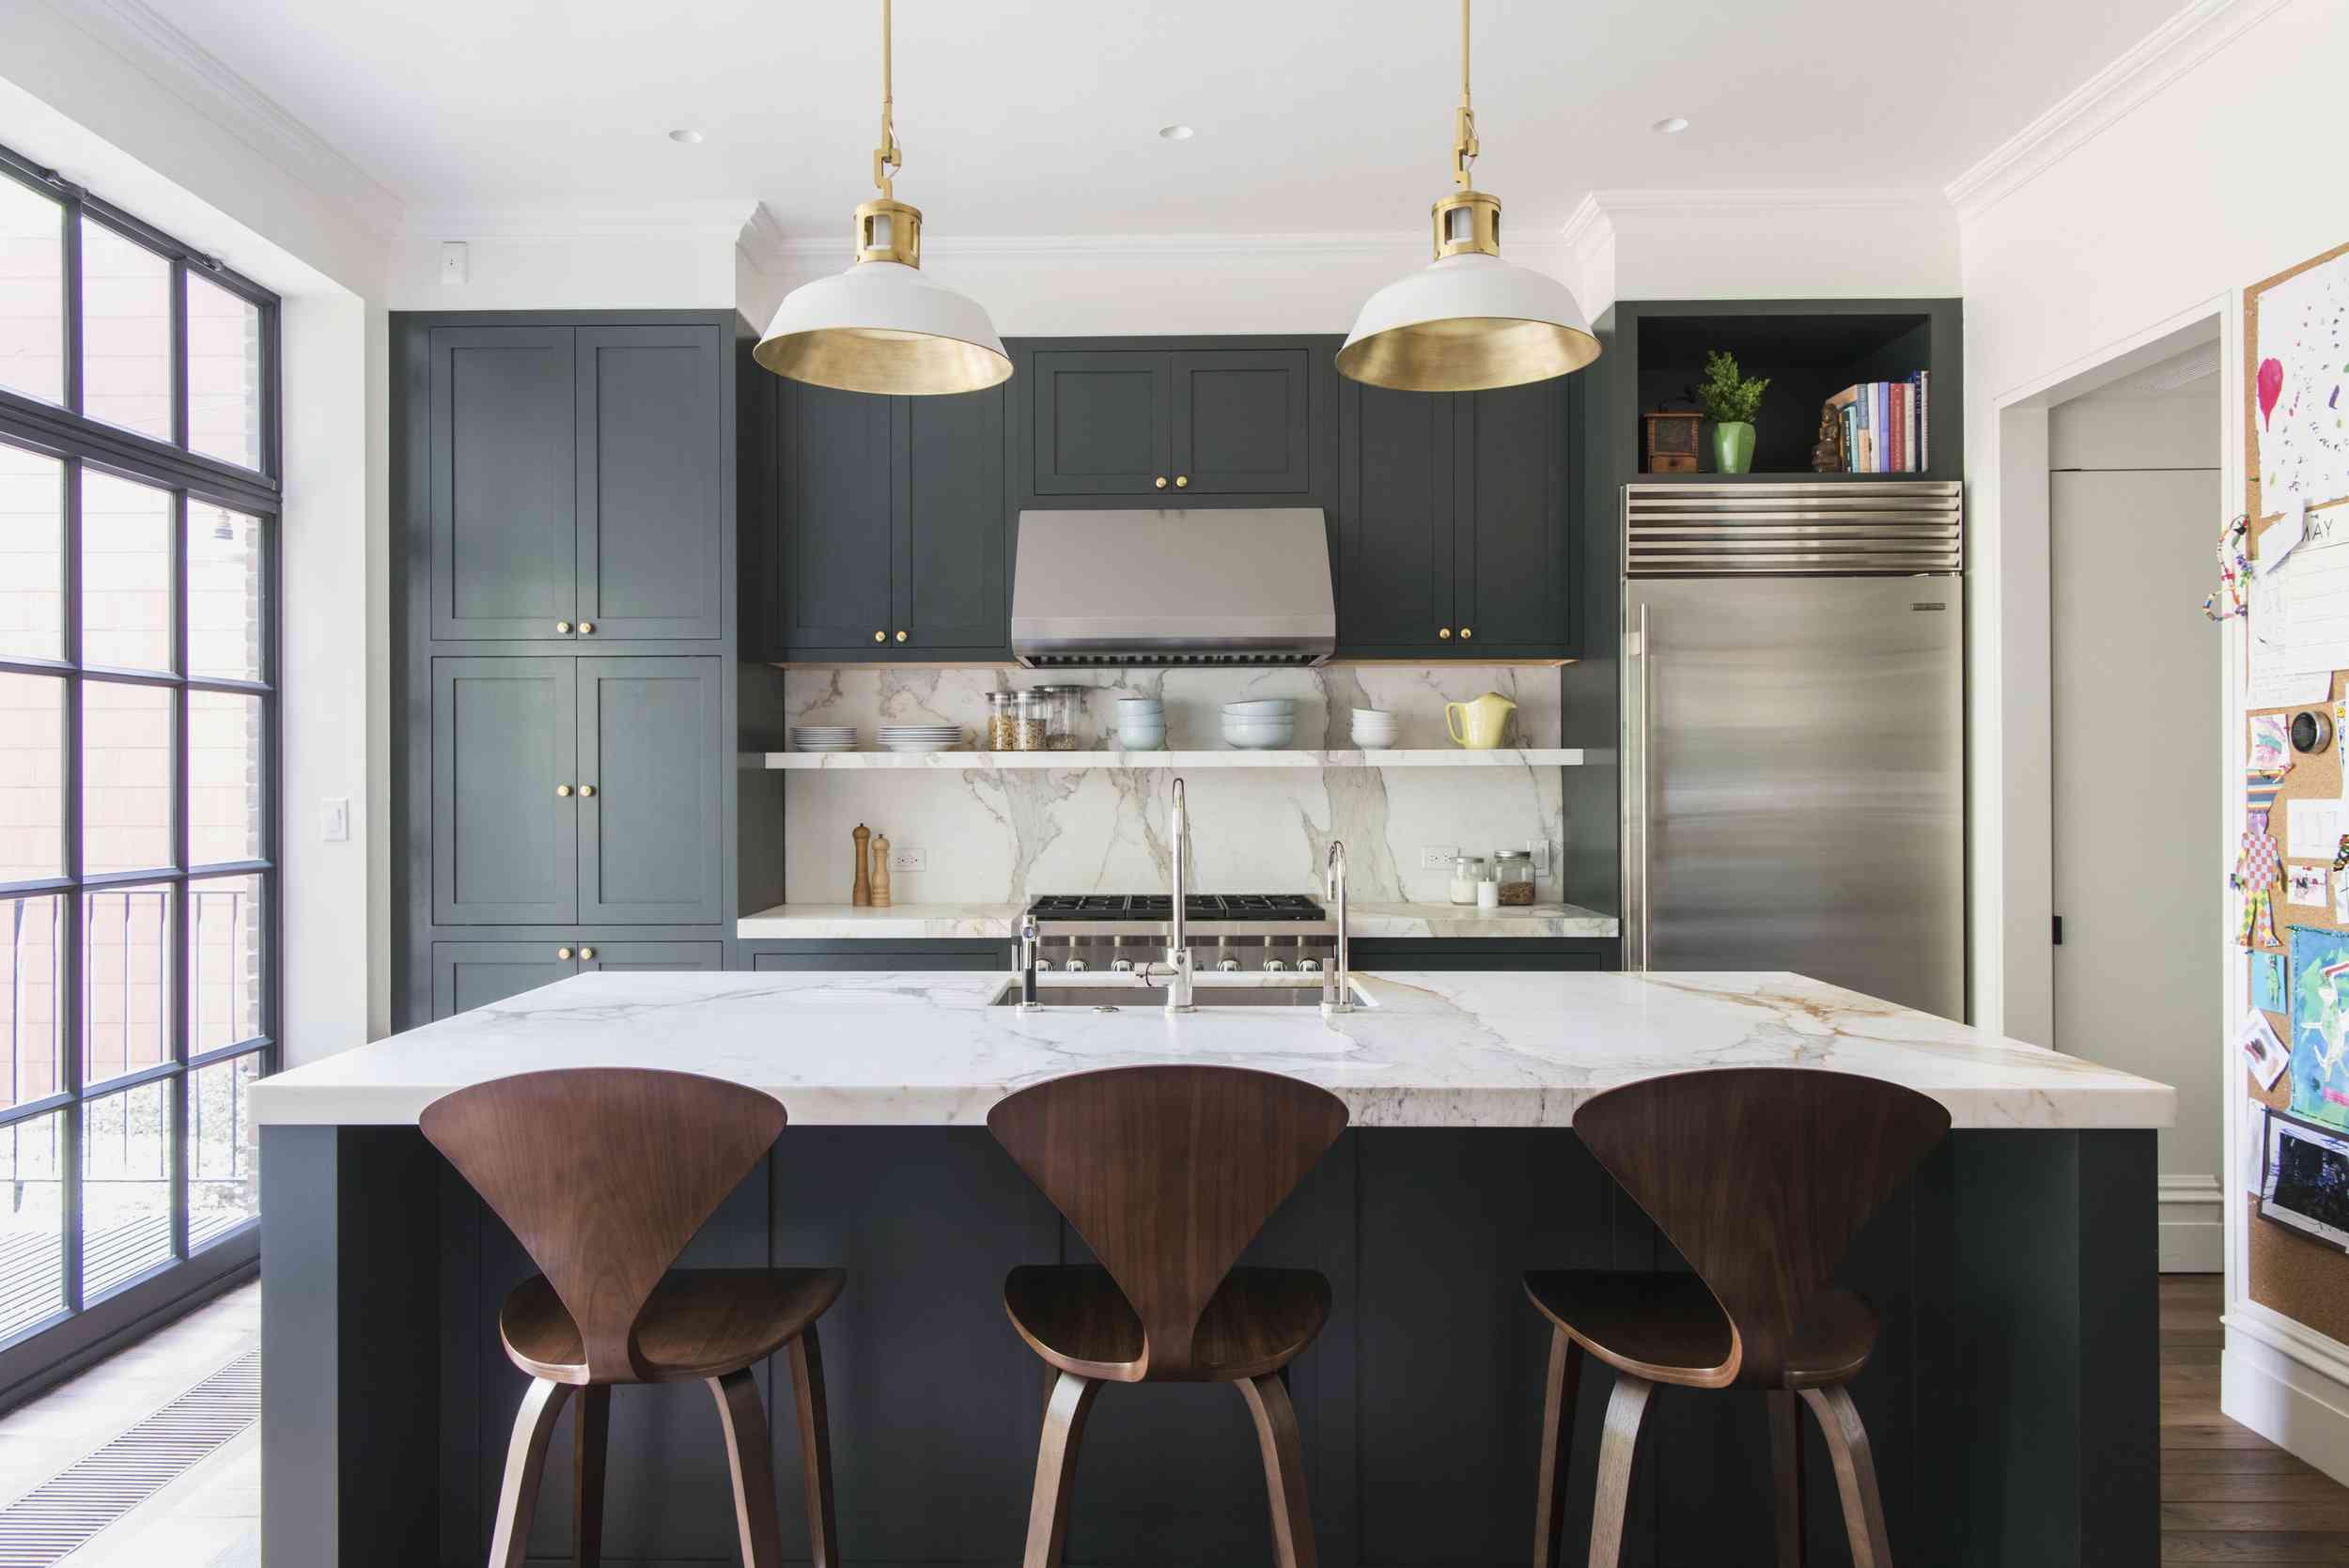 Minimalist kitchen with pendant lights, floor to ceiling bay window